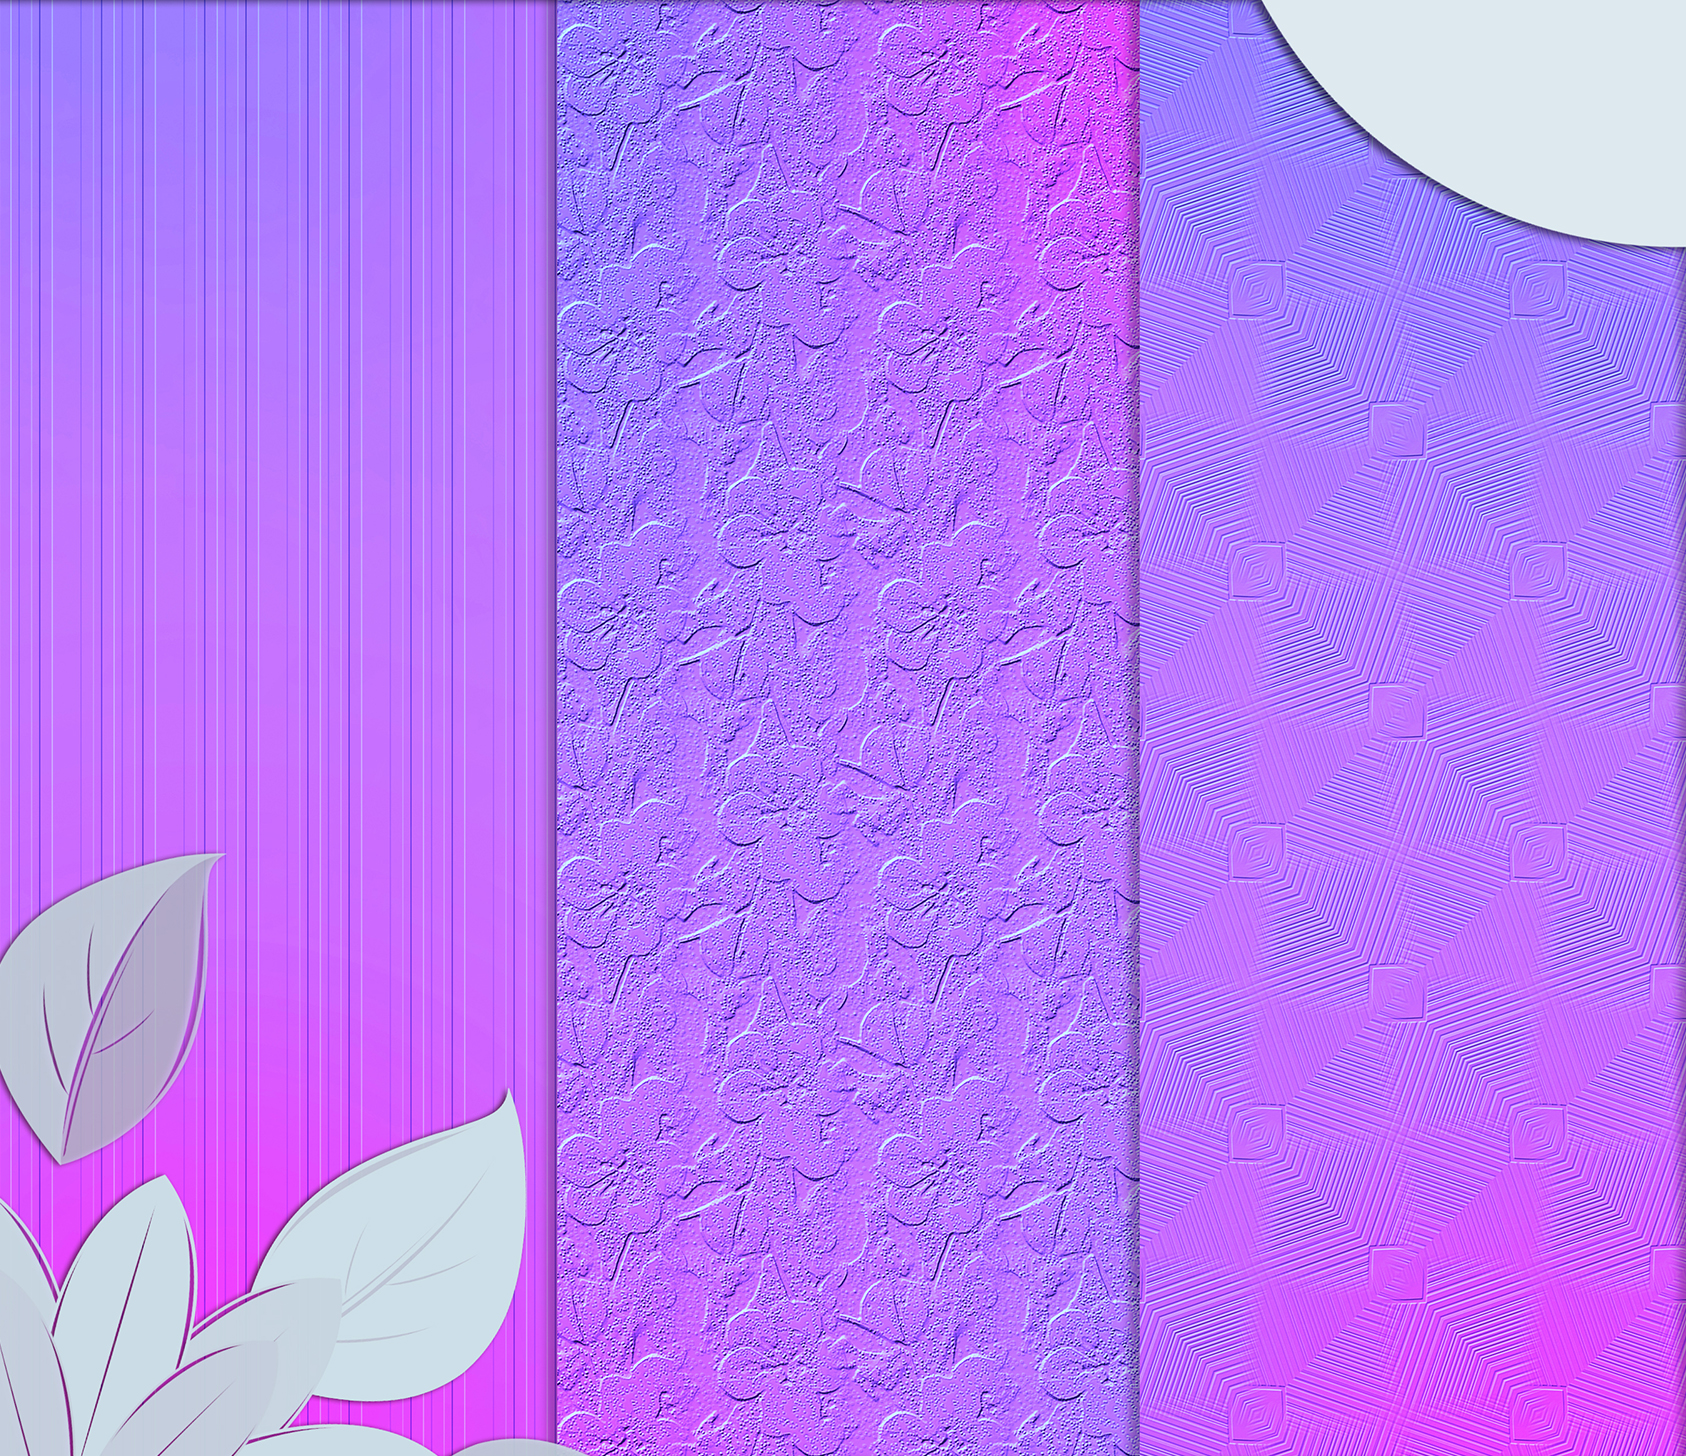 Purple-blue abstract textures, Digital Scrapbook Paper example image 5